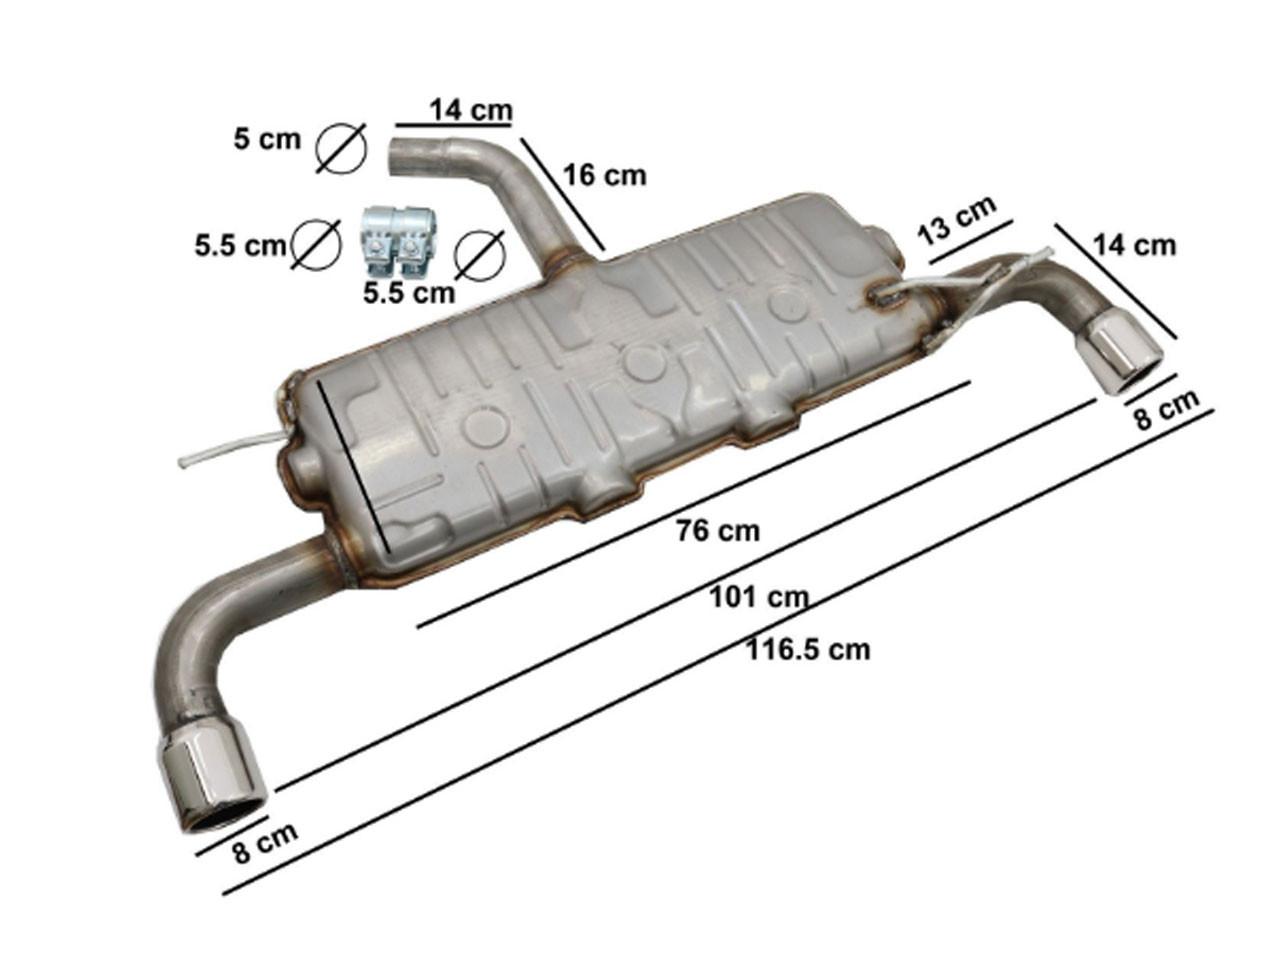 Sistem de evacuare VW Golf 5 (2003-2007) Golf 6 (2008-2013) GTI Design